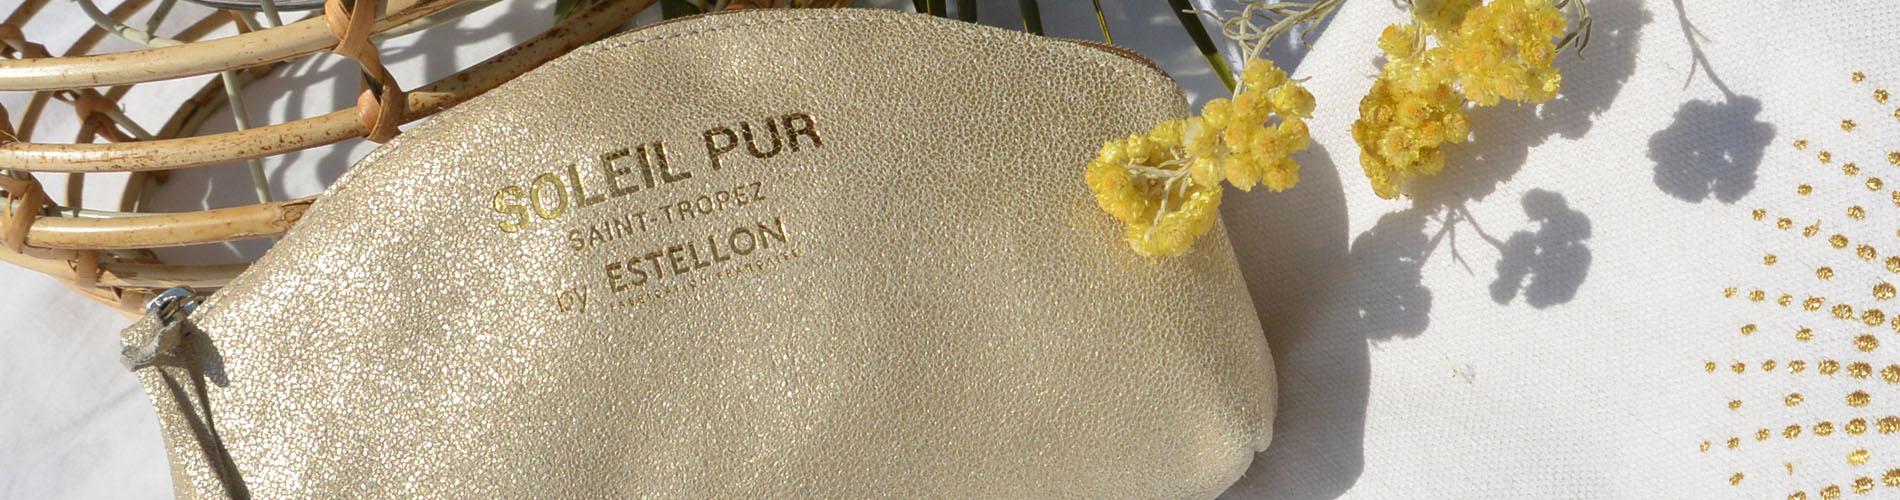 Pochette cuir Soleil Pur by Estellon